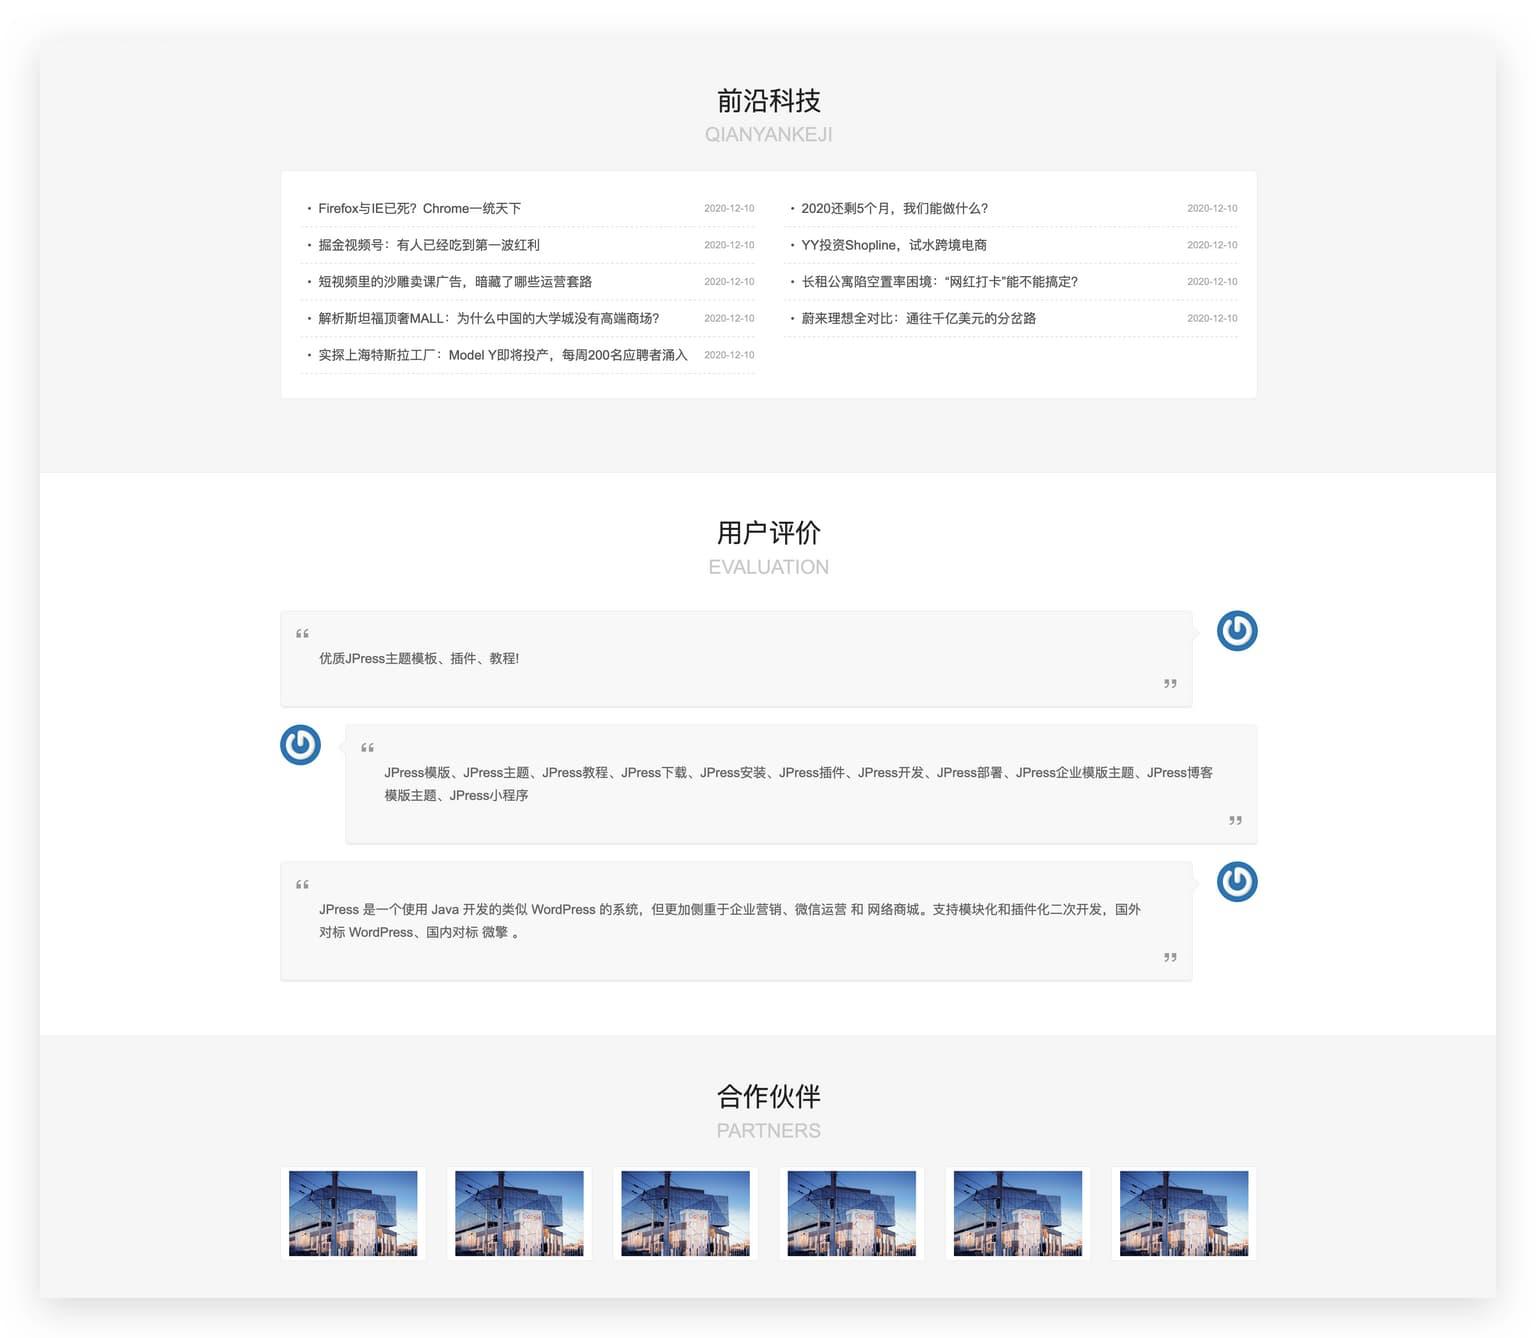 JPress企业站主题-marketing